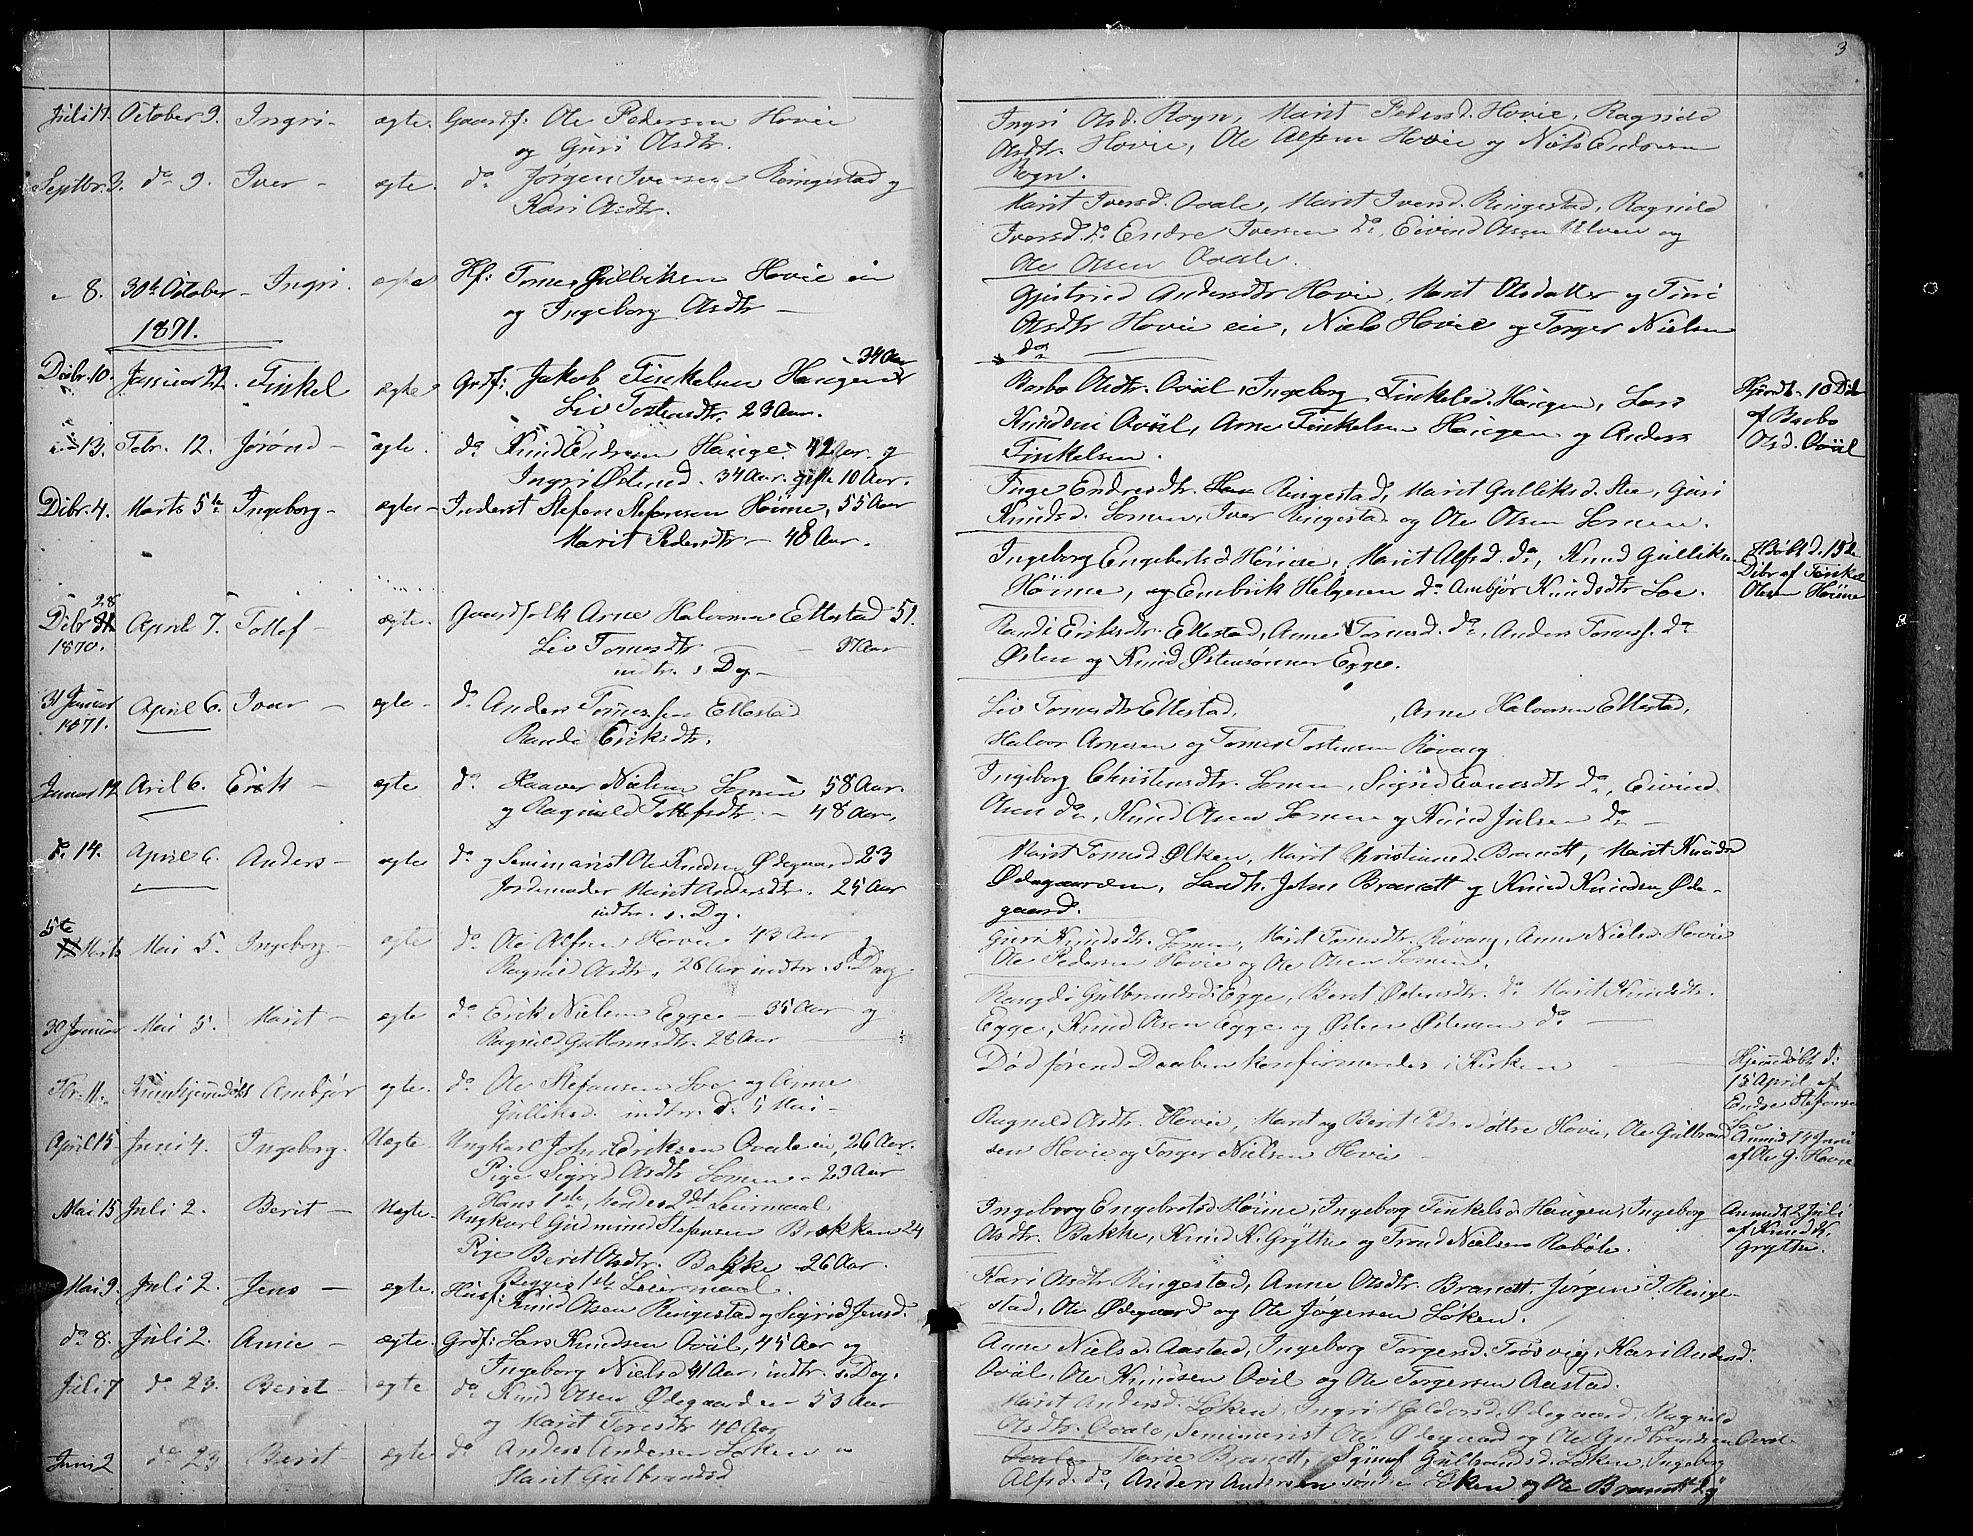 SAH, Vestre Slidre prestekontor, Klokkerbok nr. 2, 1869-1882, s. 3